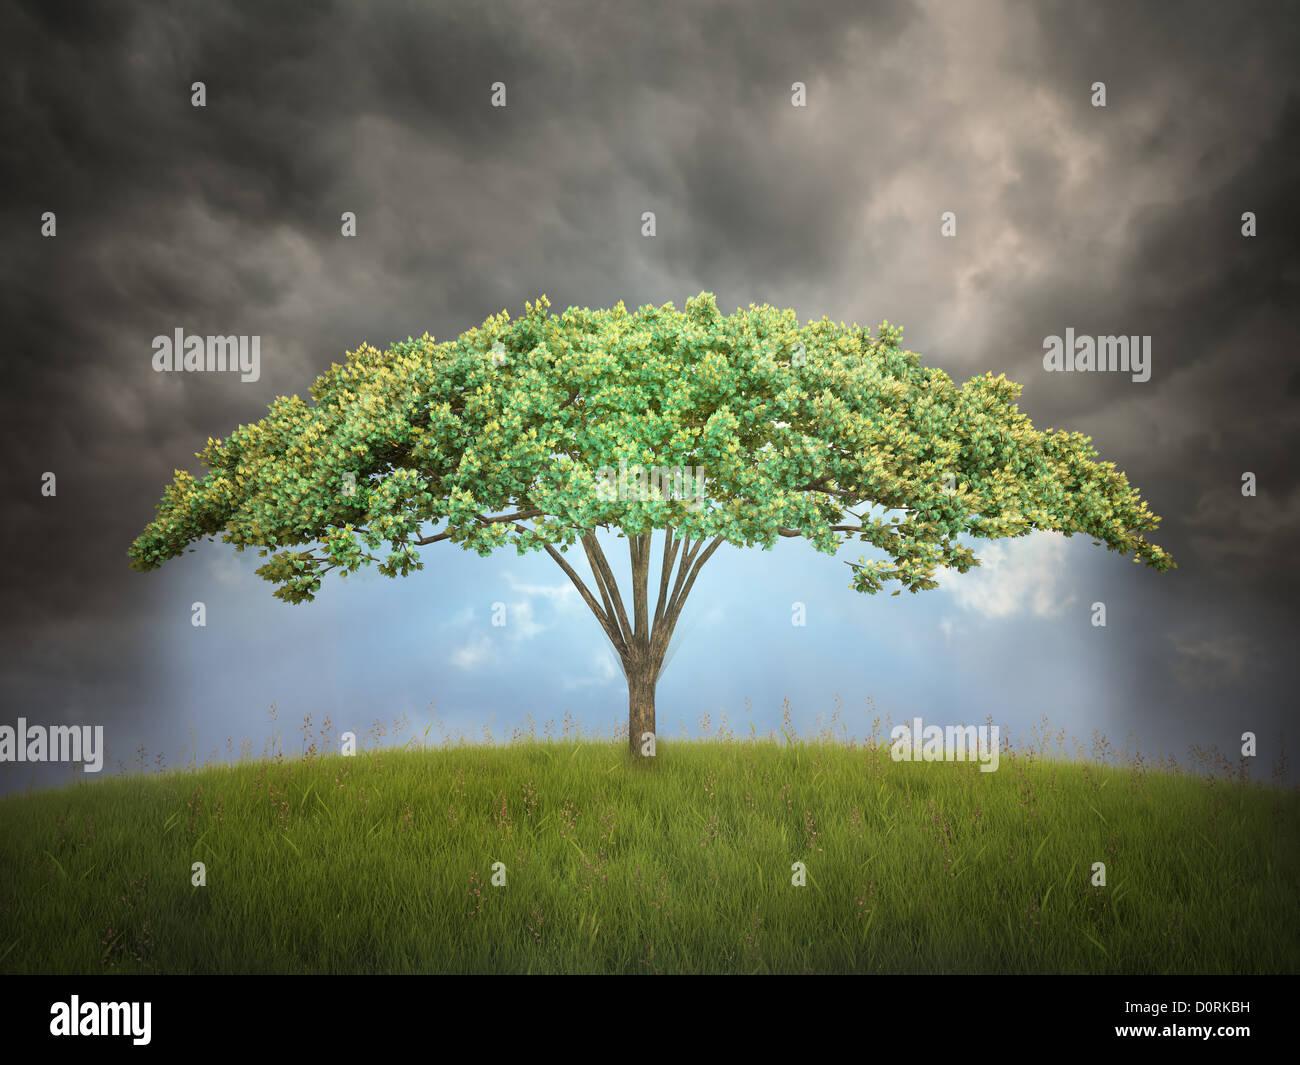 Umbrella shaped tree - Stock Image